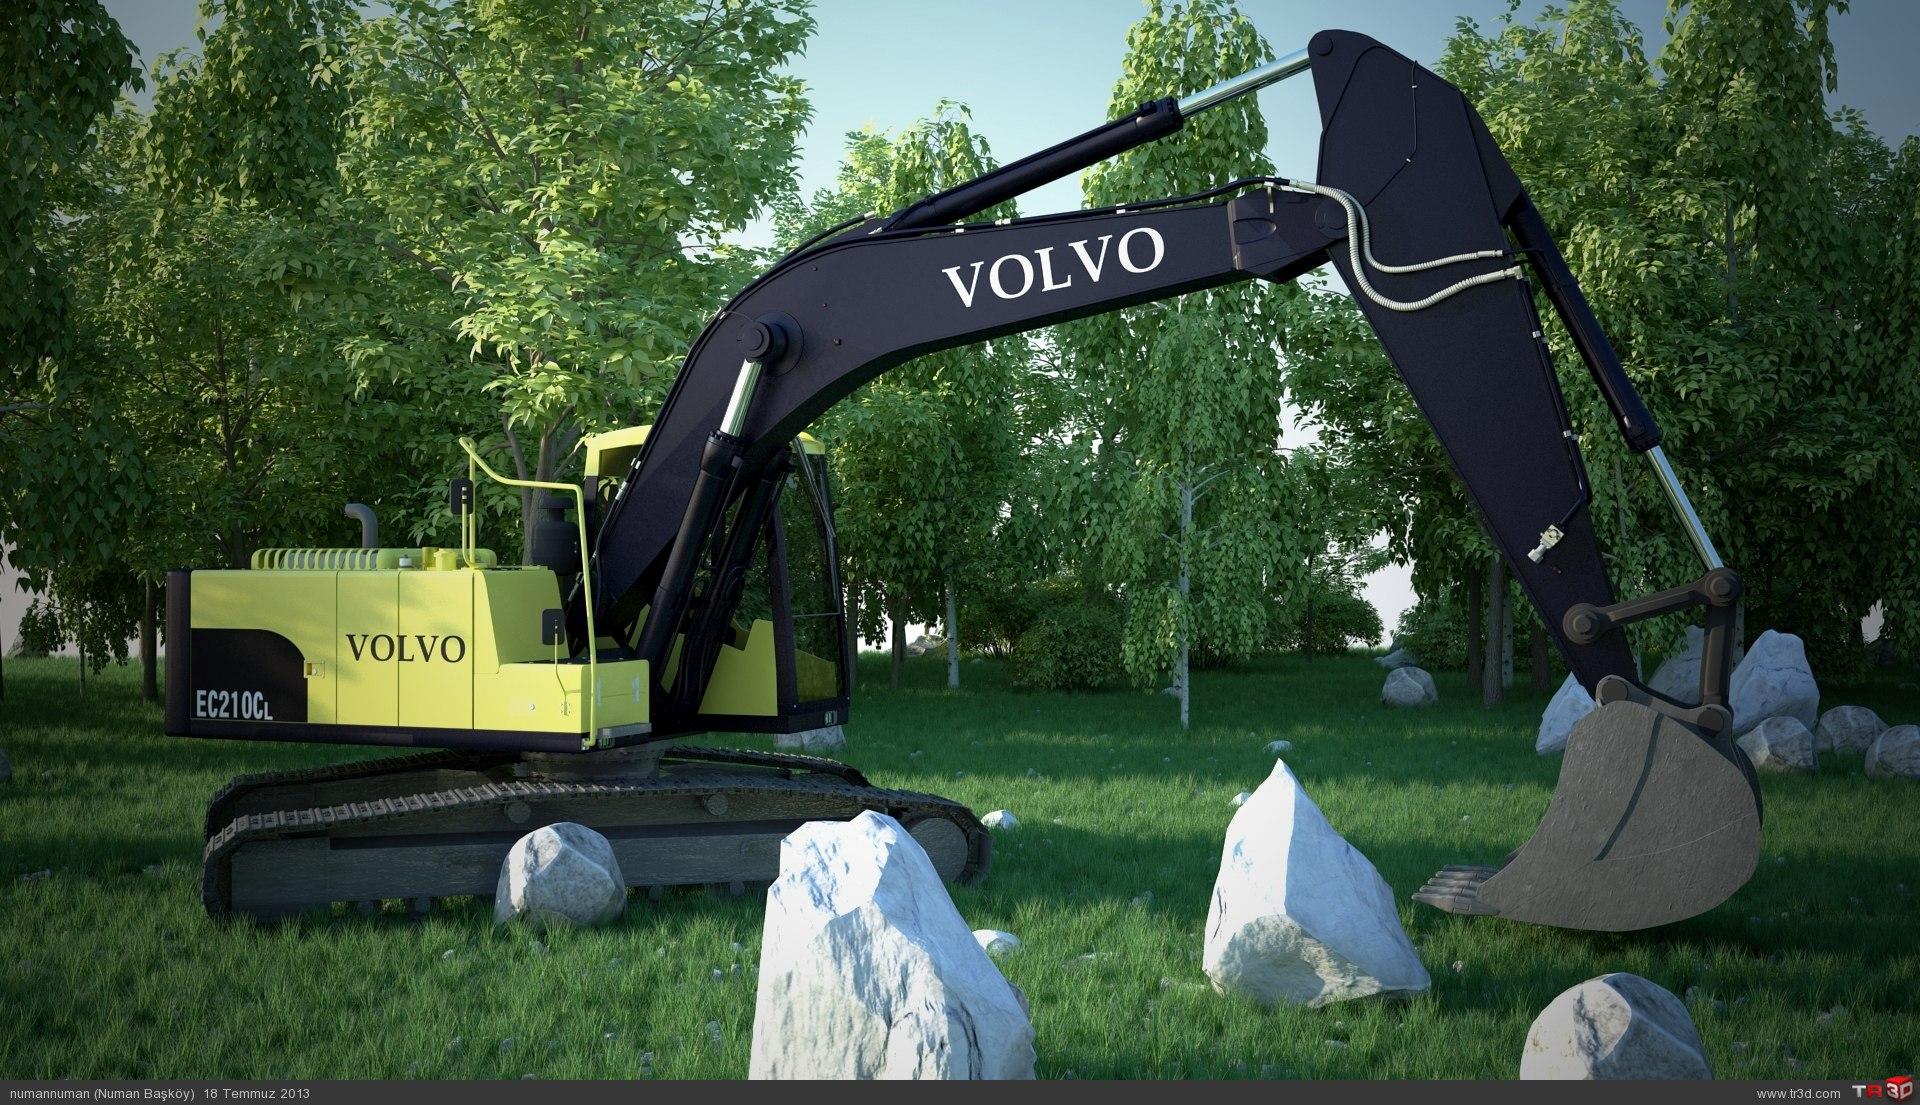 Volvo EC210Cl-2 2